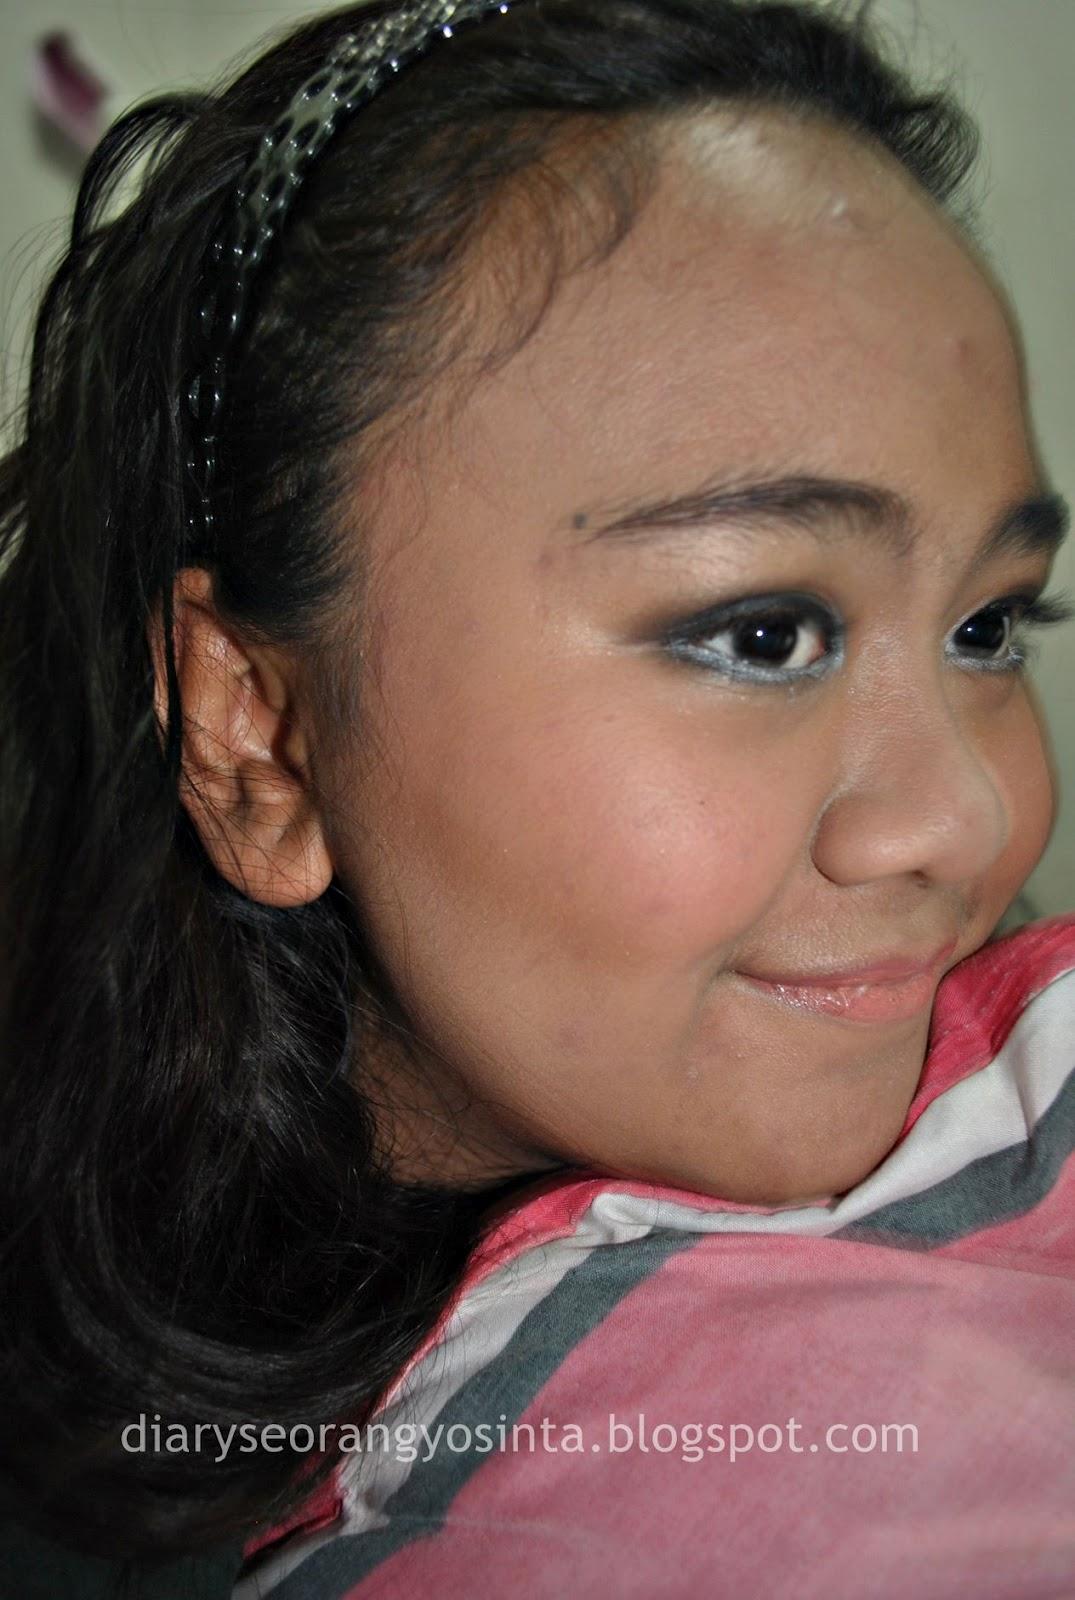 ladypon_mua: juni 2012